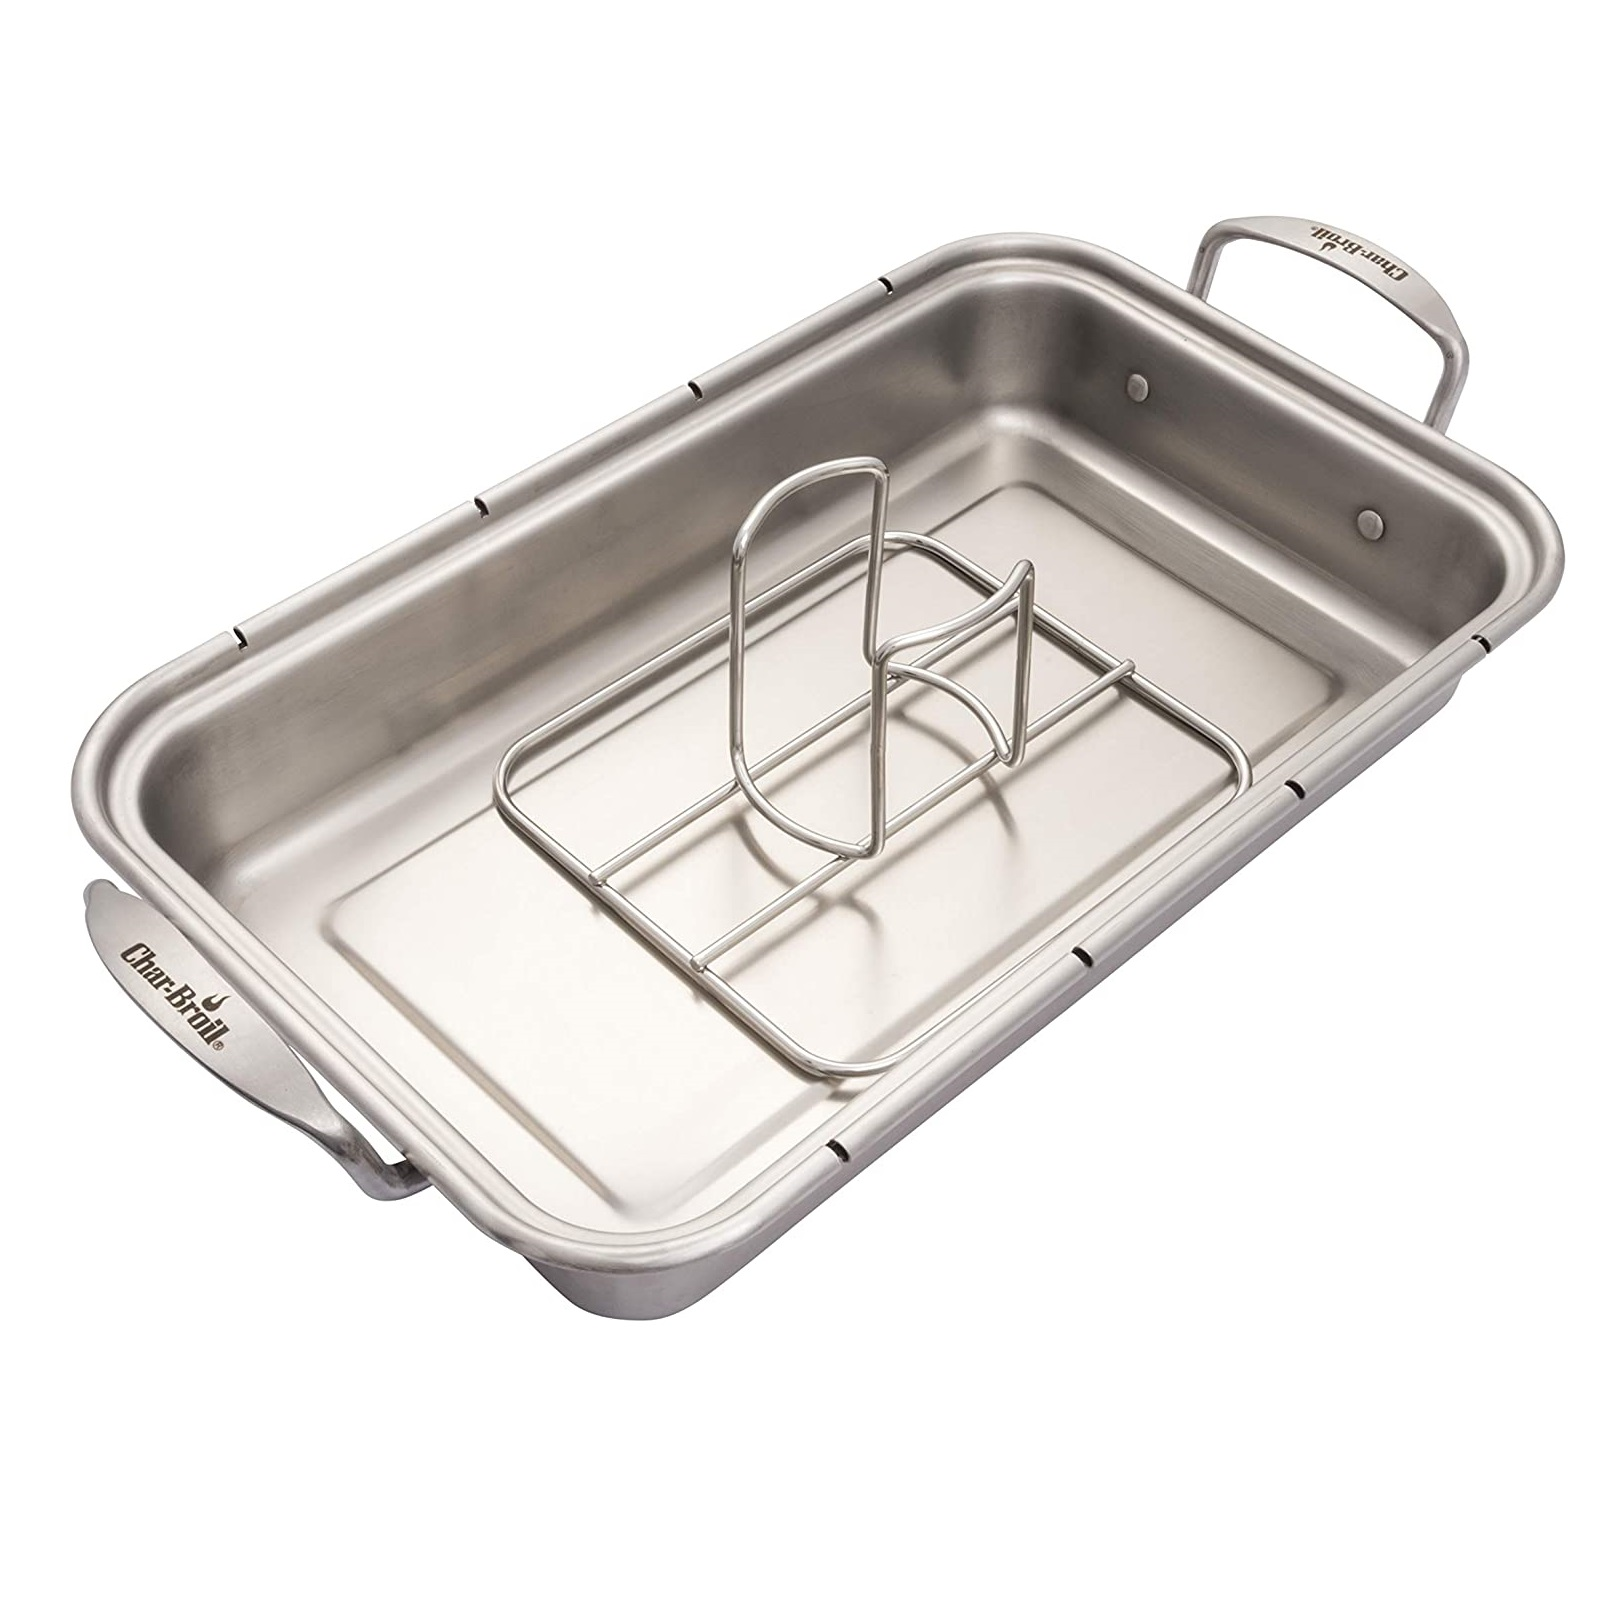 Ростер для курицы с креплением для емкости Char-broil grill+ 15х17х6,5 см